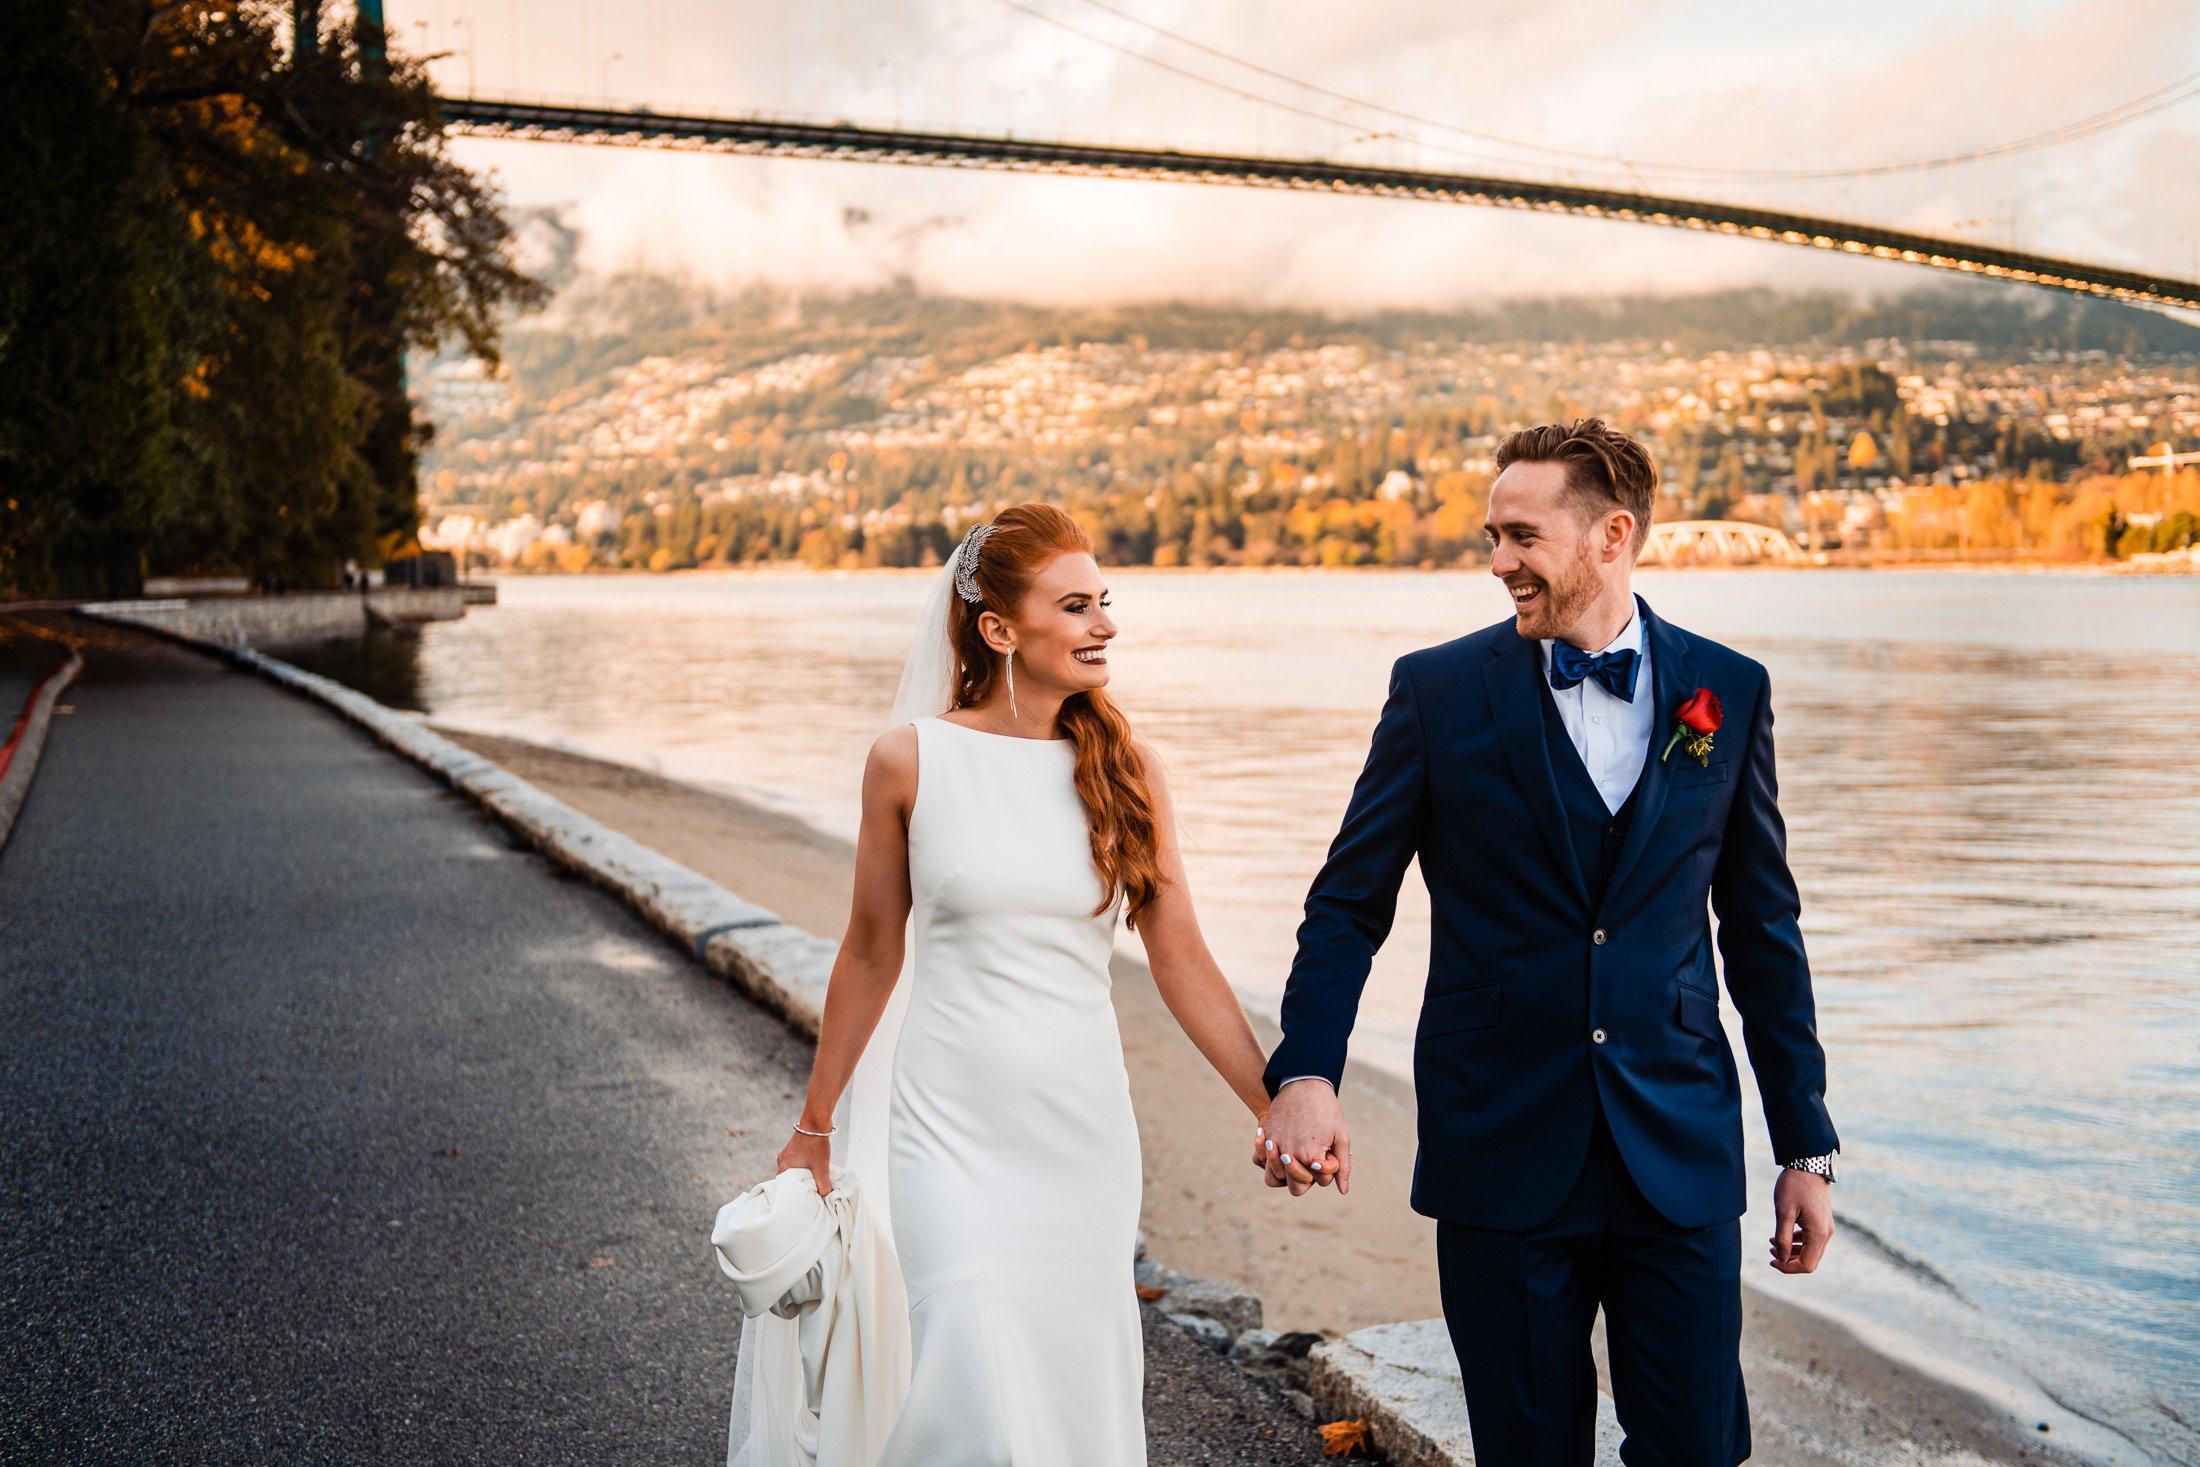 040 - vancouver seawall wedding photo